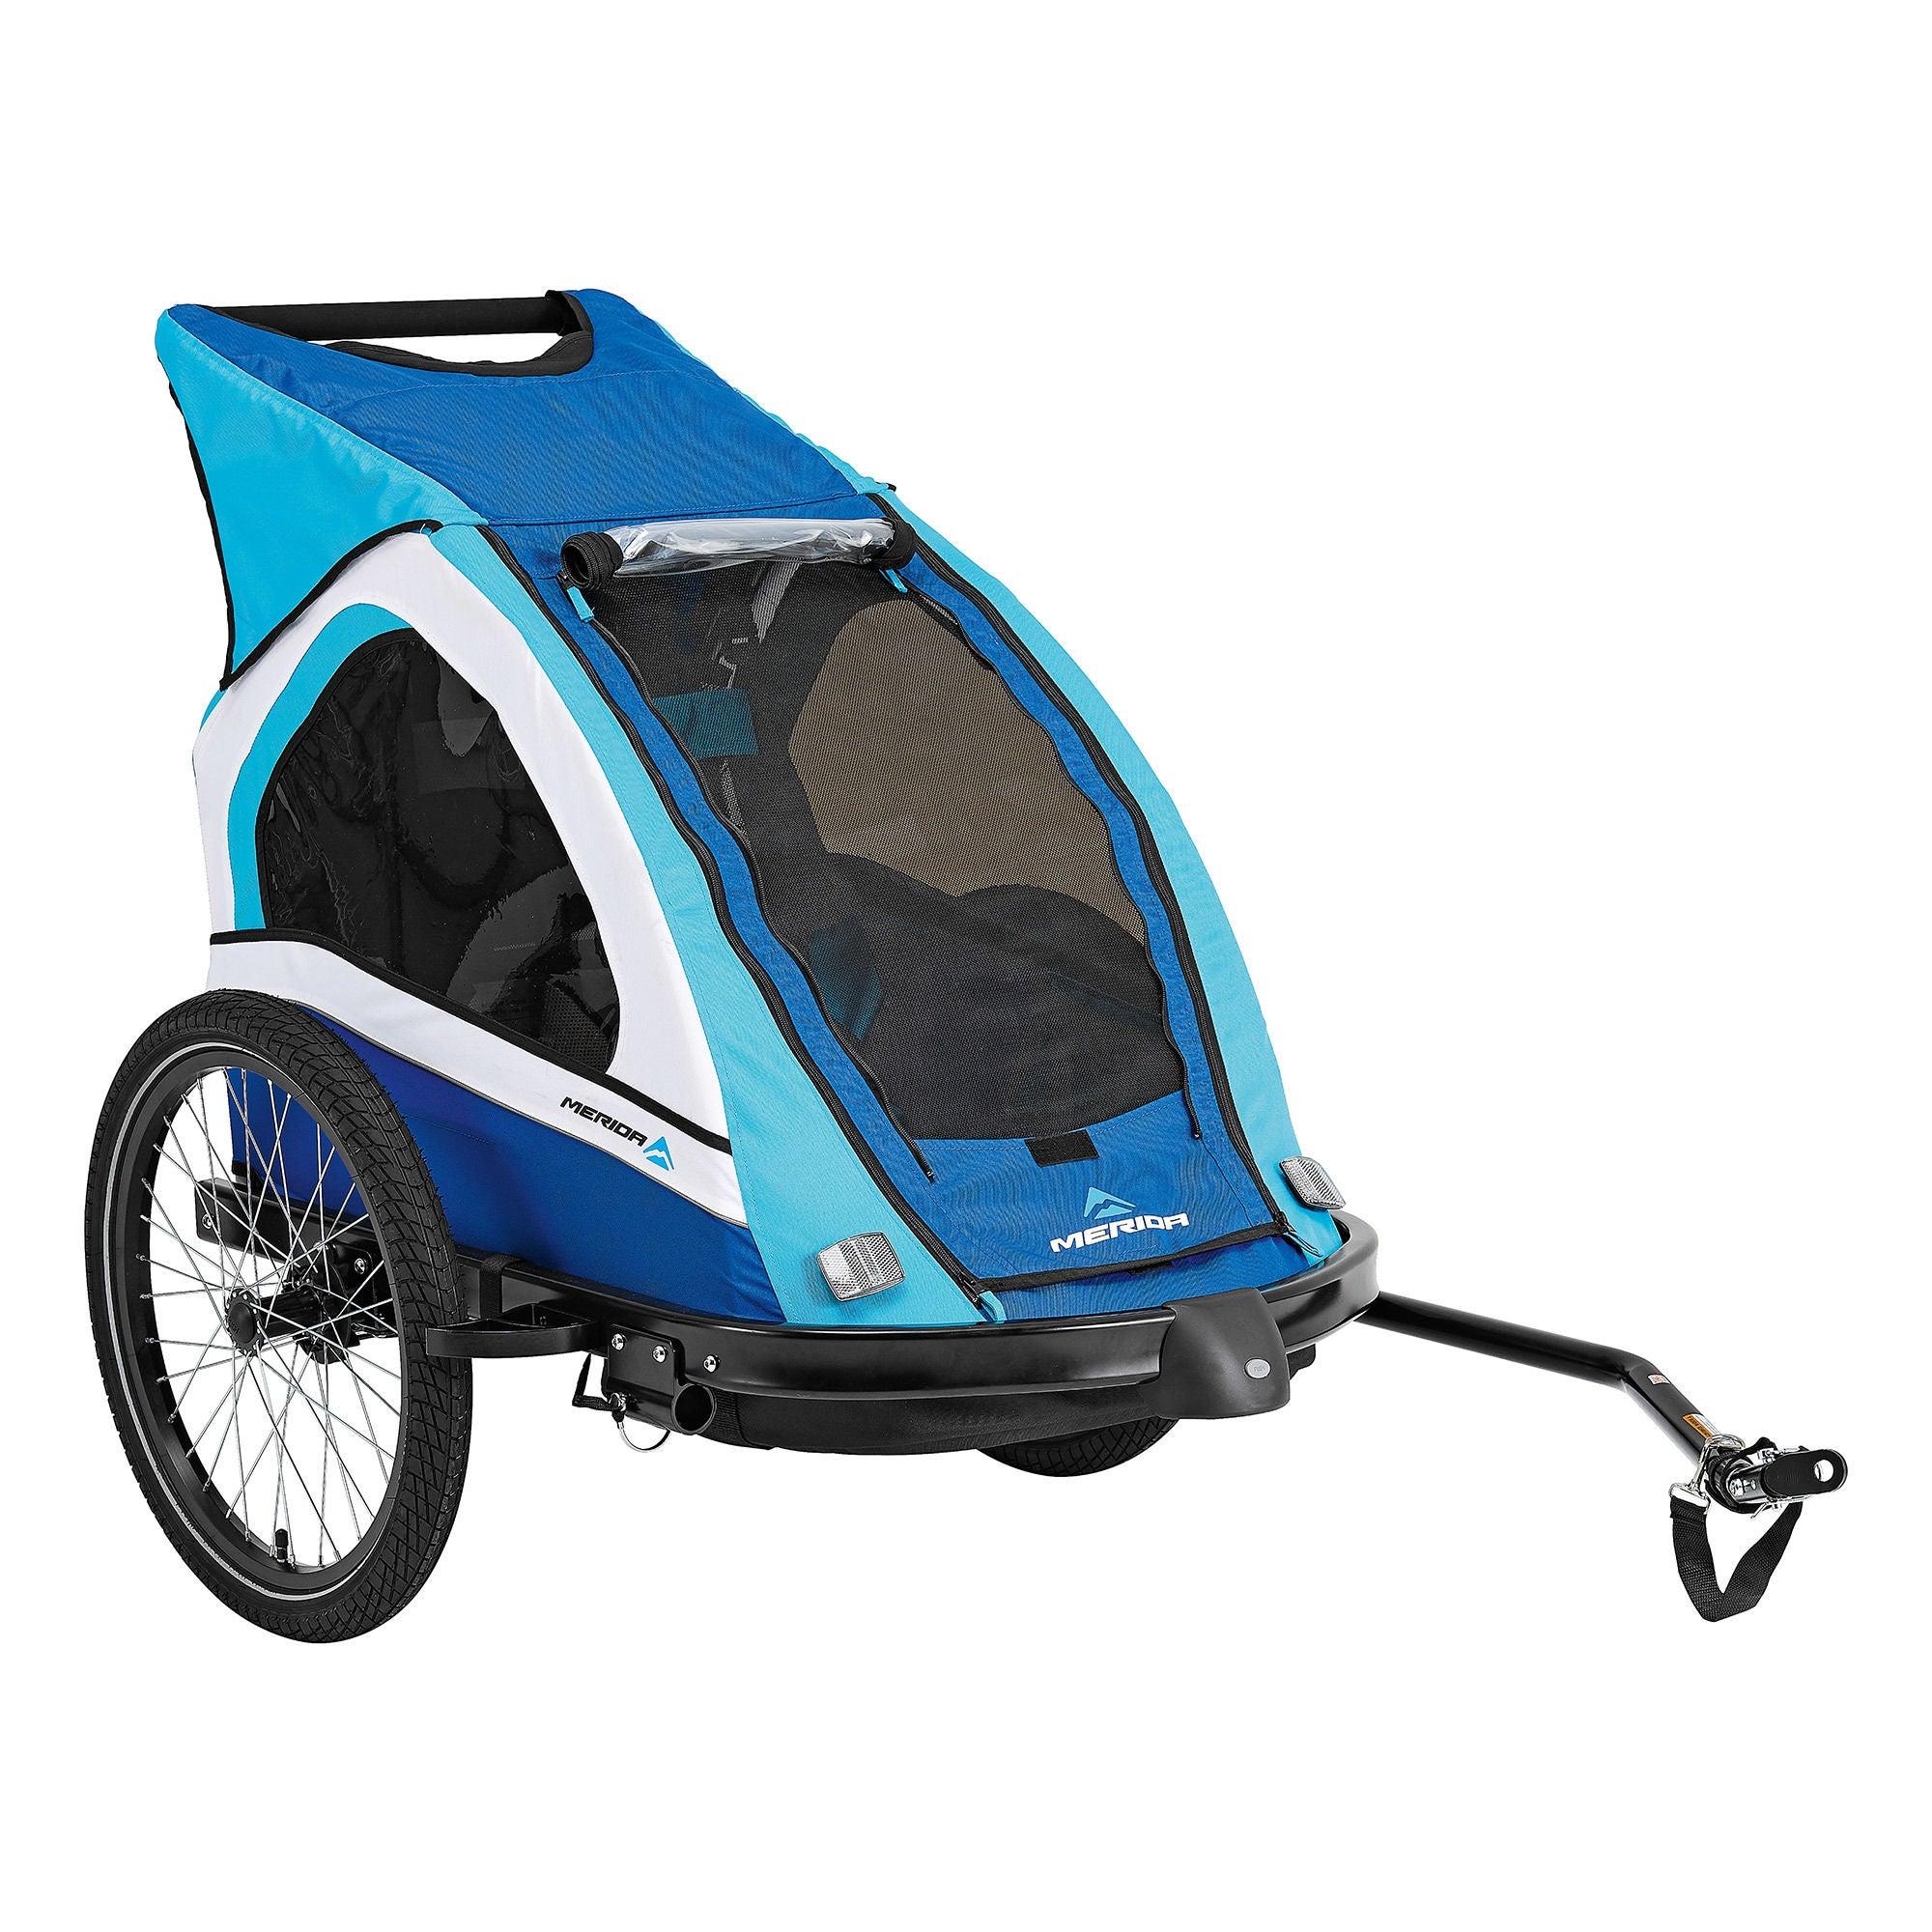 Merida Duo Cykelvagn, Blå